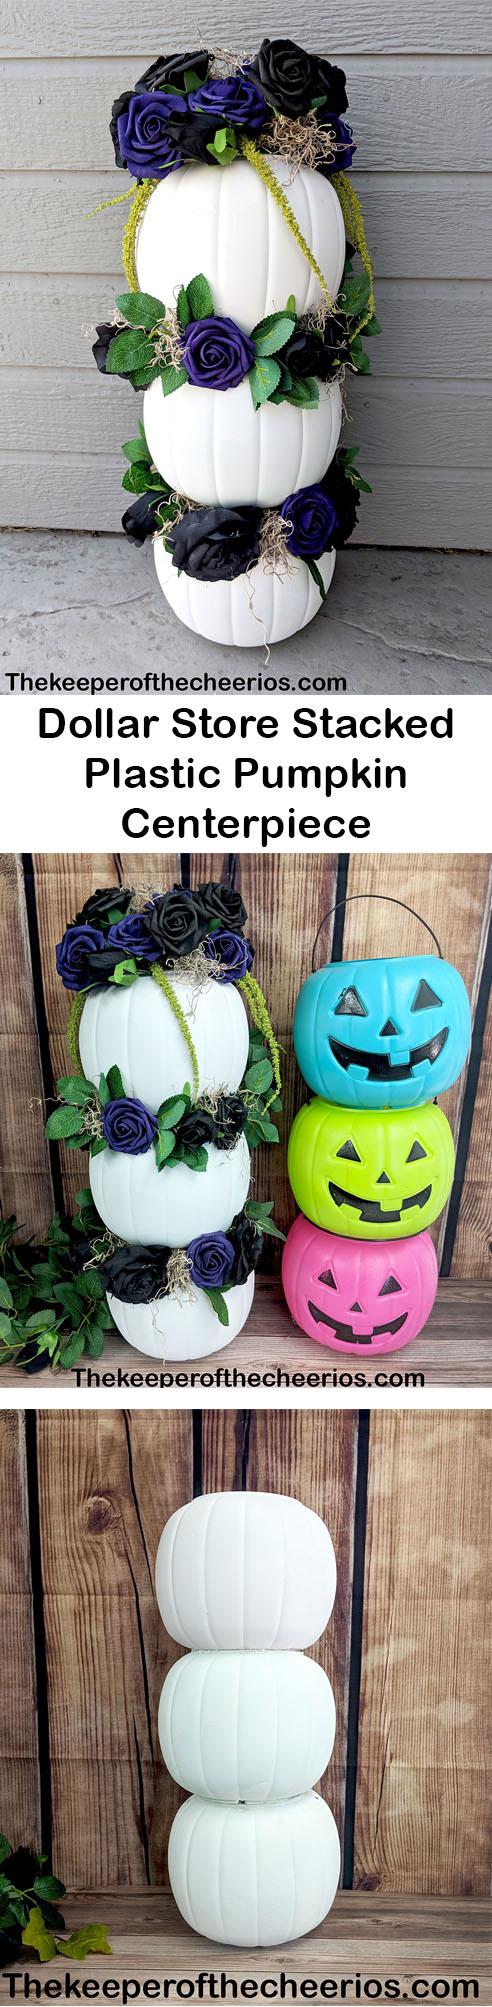 dollar-store-stacked-plastic-pumpkin-centerpiece